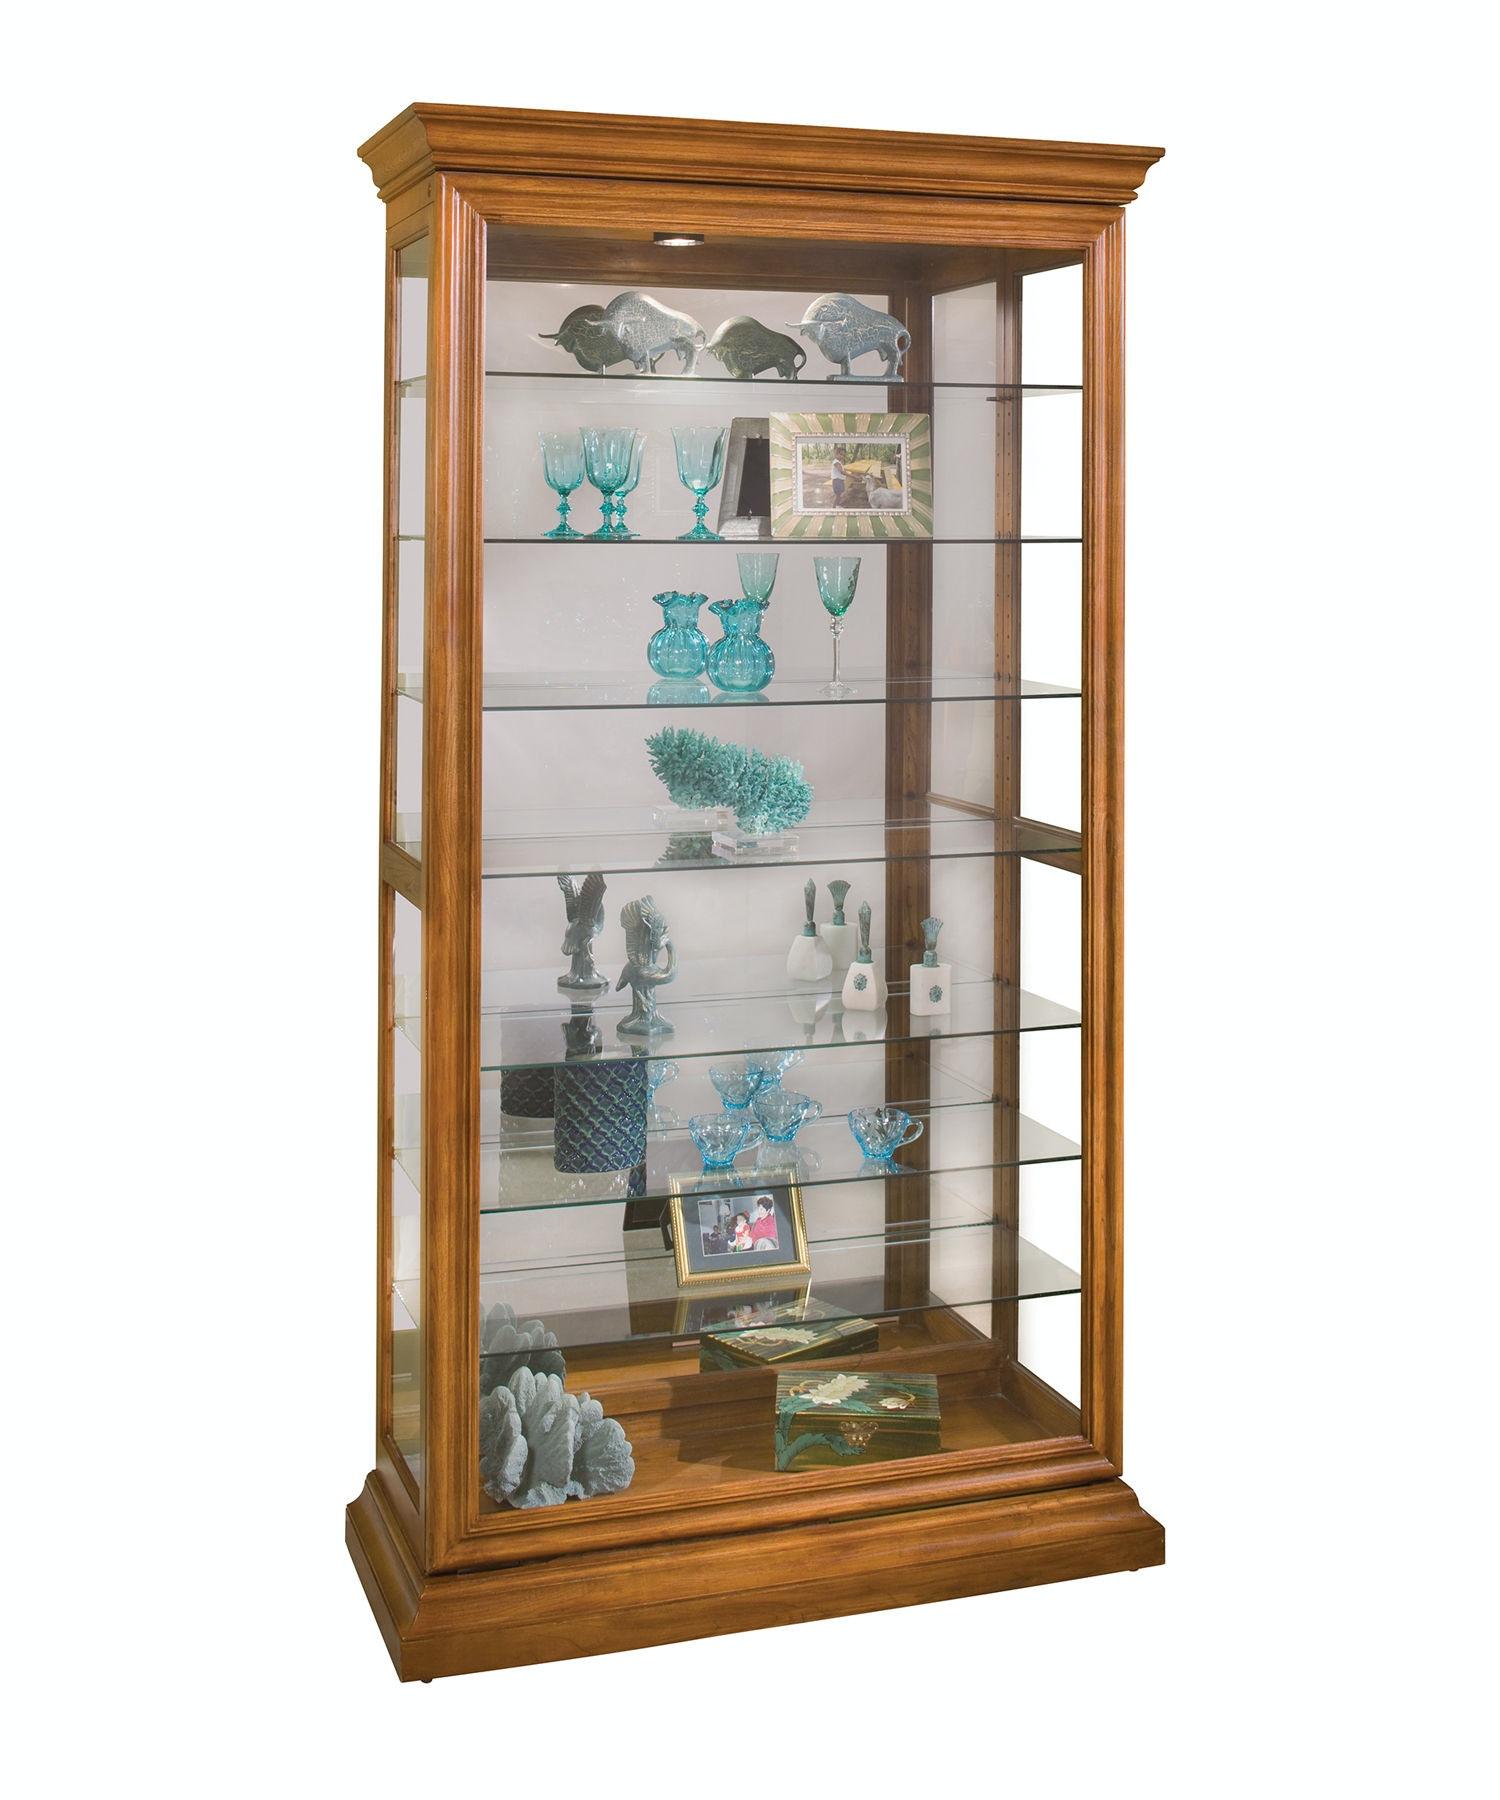 Philip Reinisch Collectors Curio Cabinet 58251  sc 1 st  Wendellu0027s Furniture & Philip Reinisch Collectors Curio Cabinet - Wendellu0027s Furniture ...